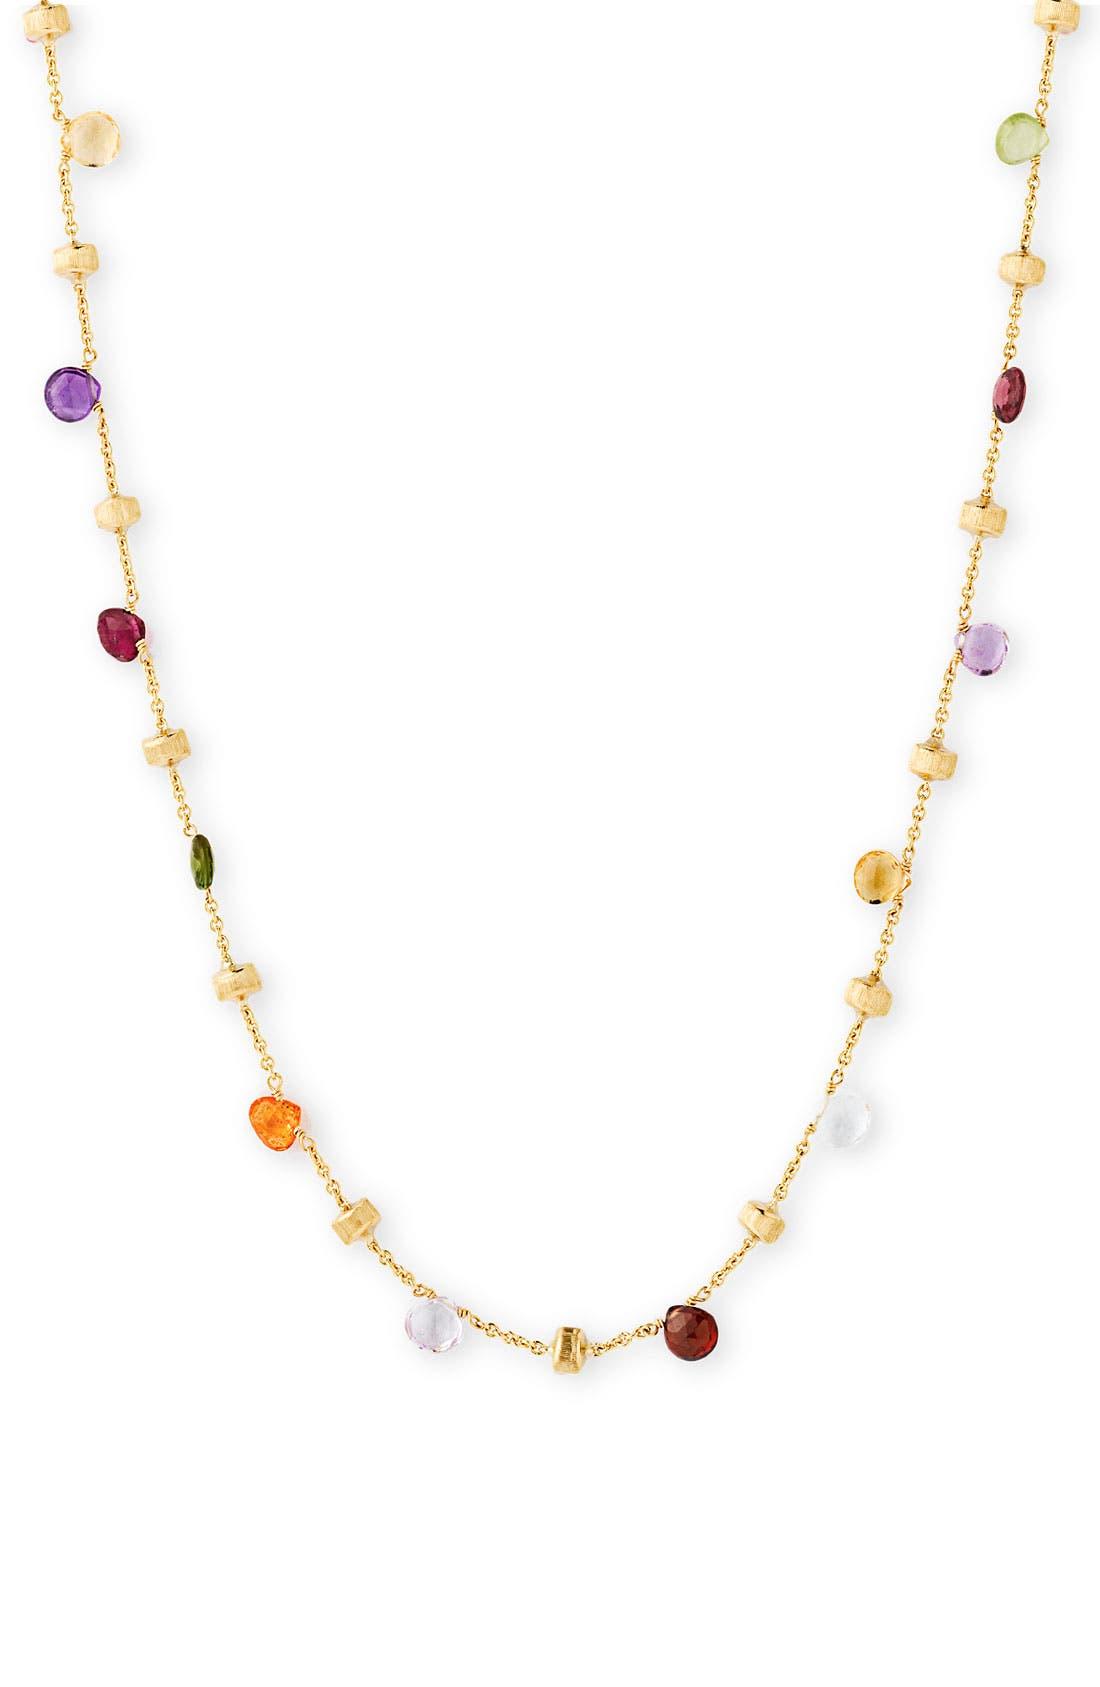 Main Image - Marco Bicego 'Paradise' Single Strand Semiprecious Necklace